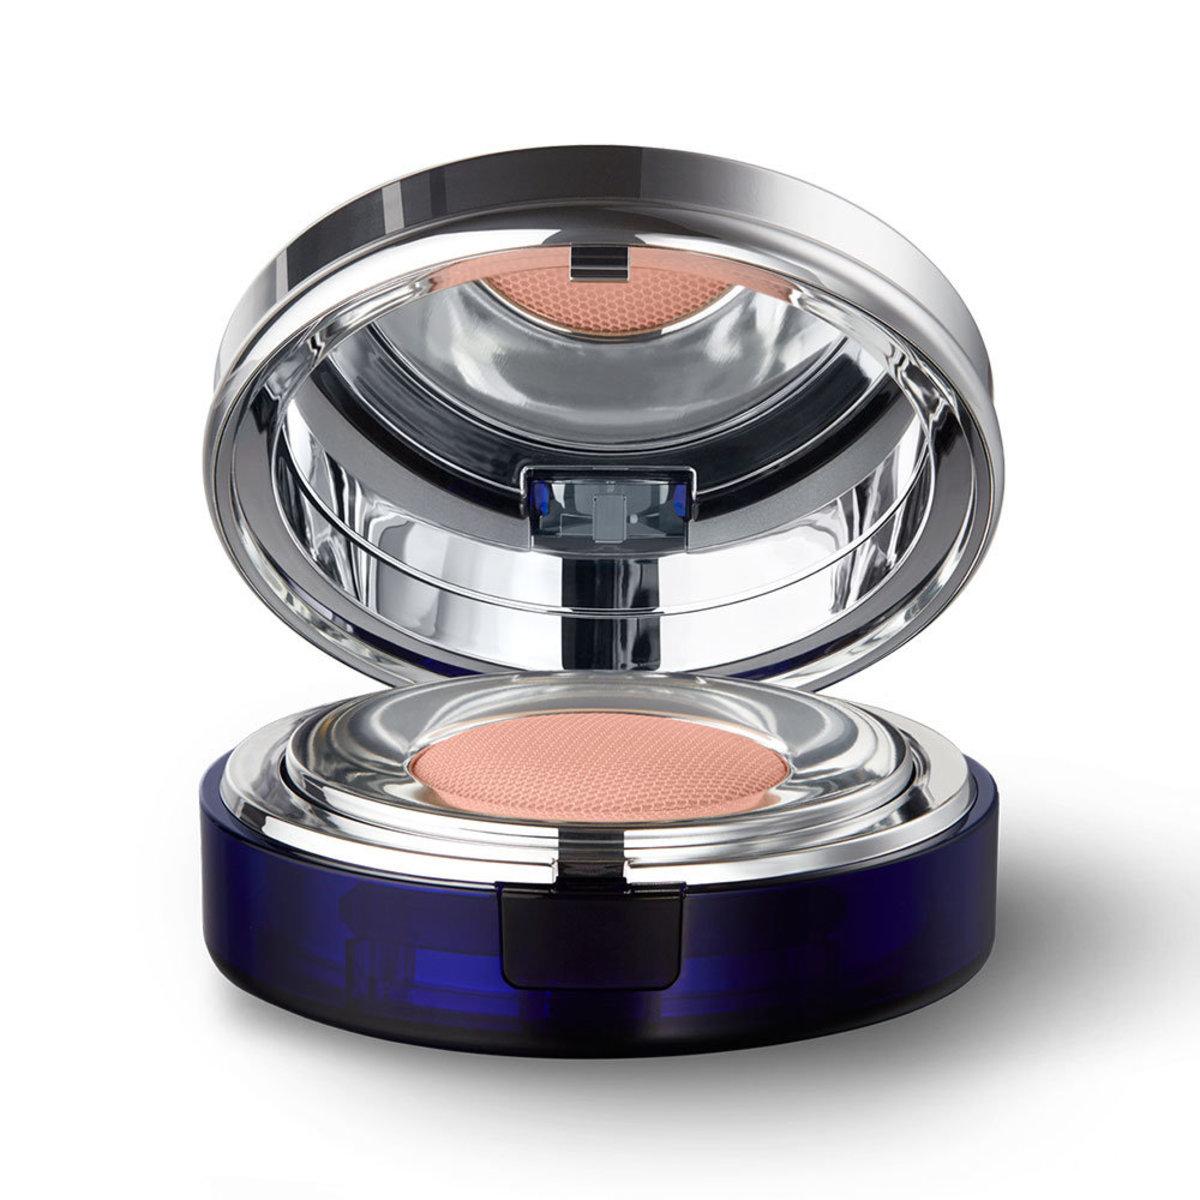 Skin Caviar Essence-In-Foundation Spf 25 PA+++ (Petale) 15ml*2